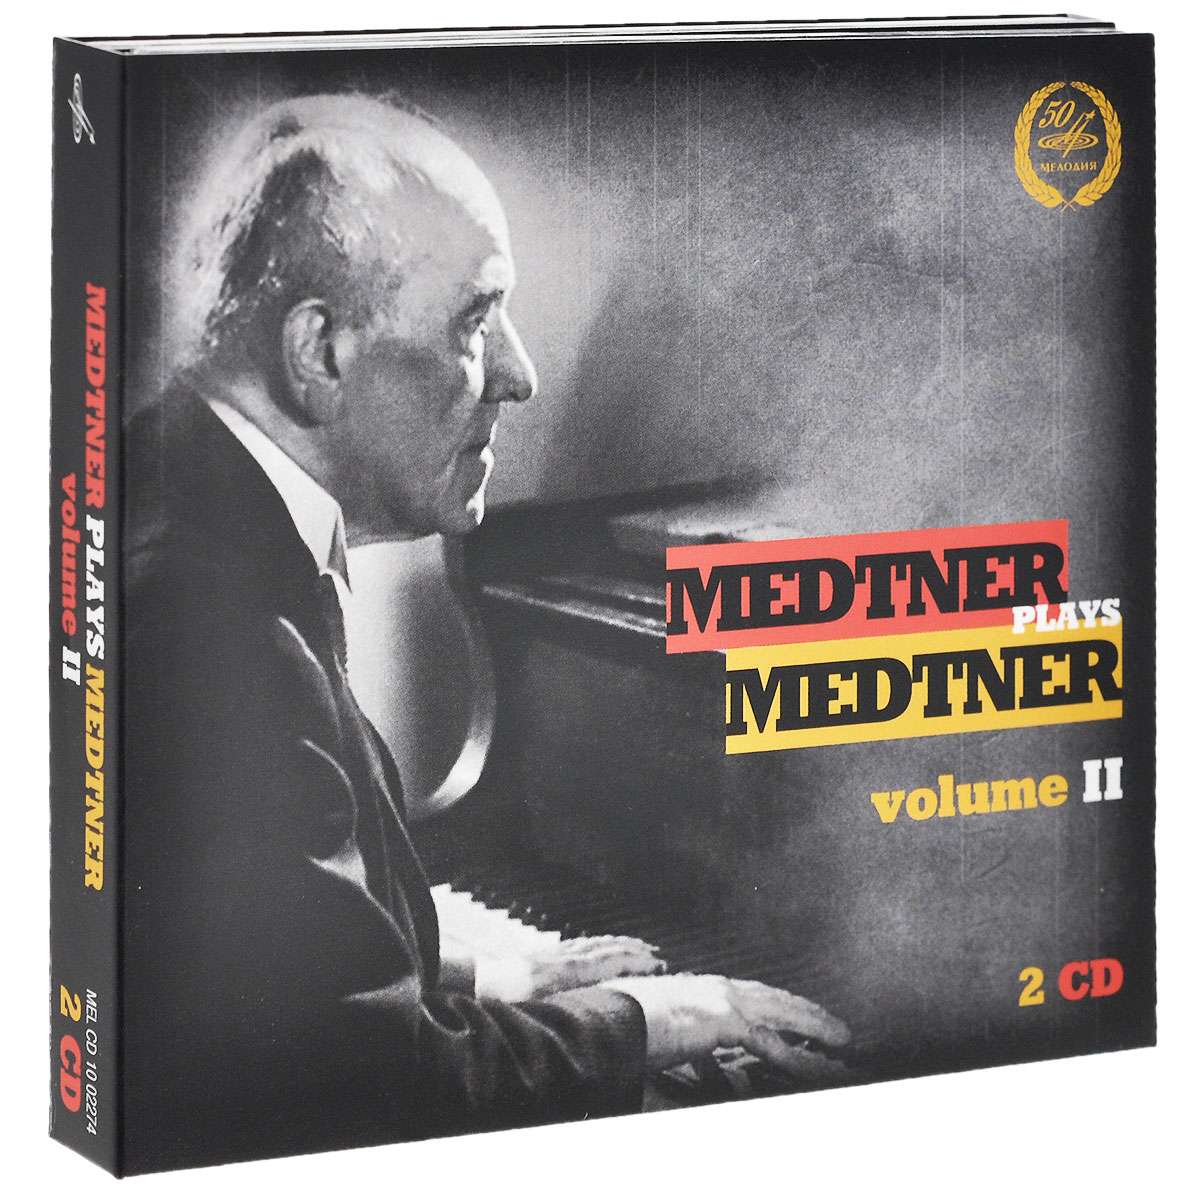 Николай Метнер,Orchestre Philharmonia de Londres,George Welldon,Иссей Добровен Medtner Plays Medtner Volume II (2 CD) цена